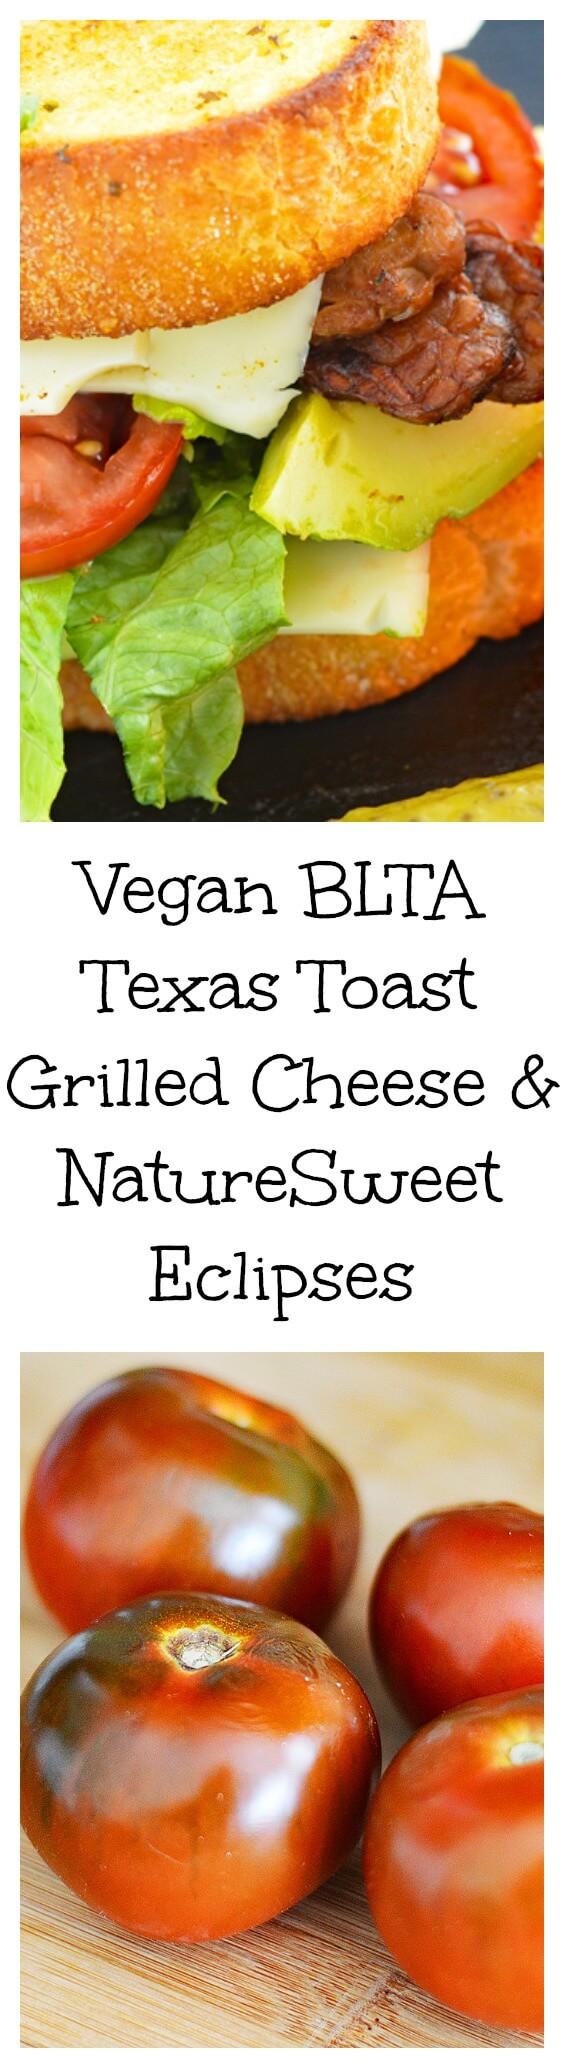 Vegan BLTA Texas Toast Grilled Cheese